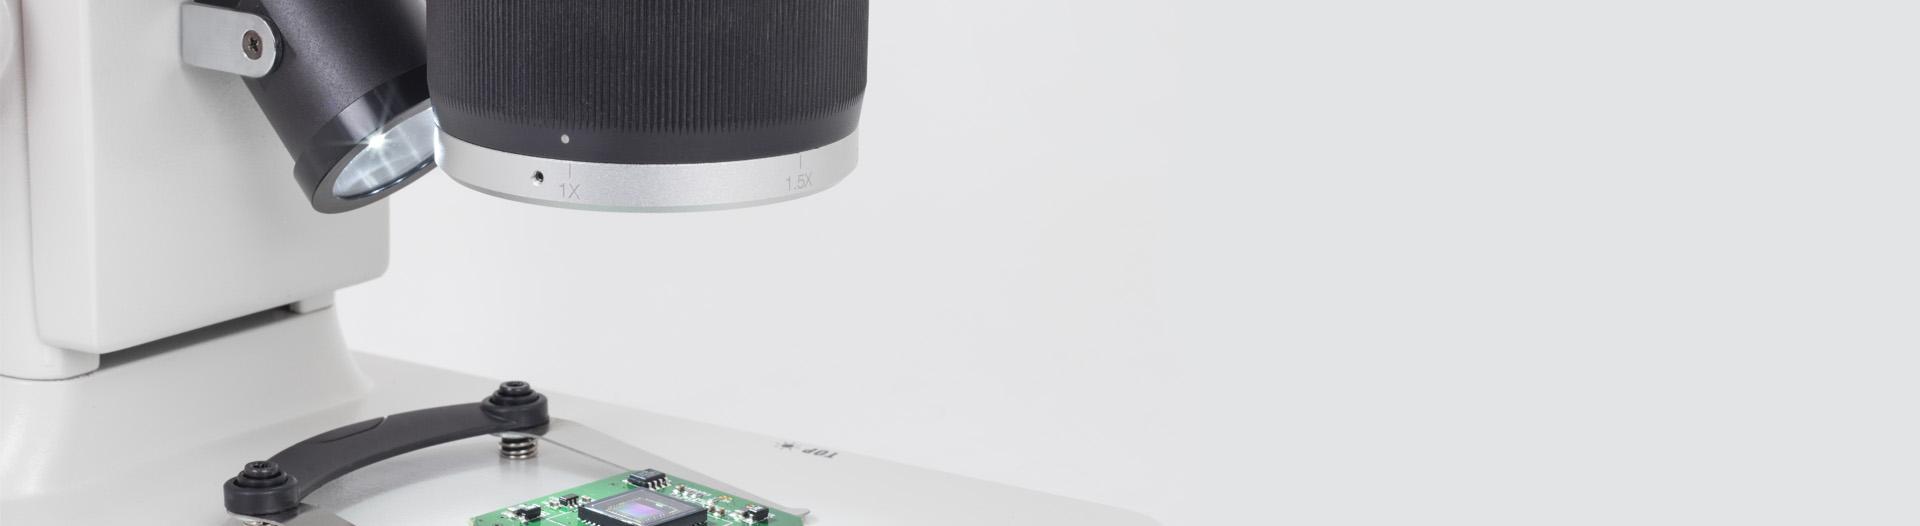 RED30 microscope Optics